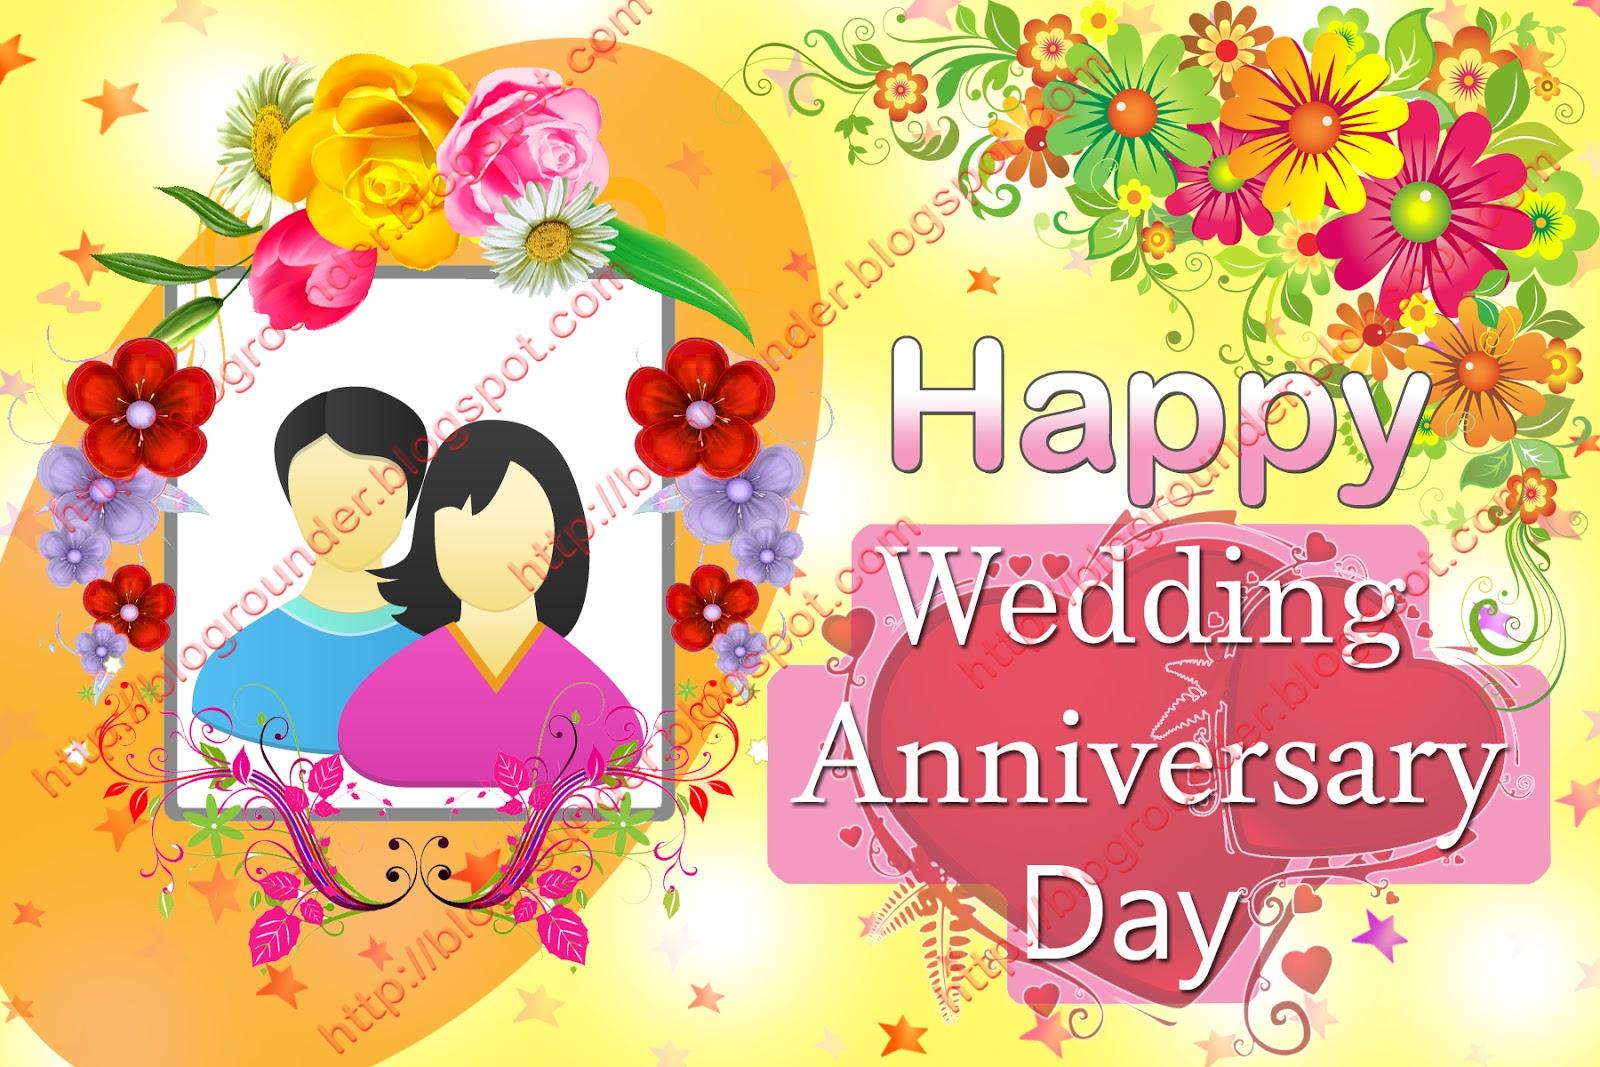 Happy wedding anniversary day greeting photoshop psd file free happy wedding anniversary day greeting photoshop psd file free download m4hsunfo